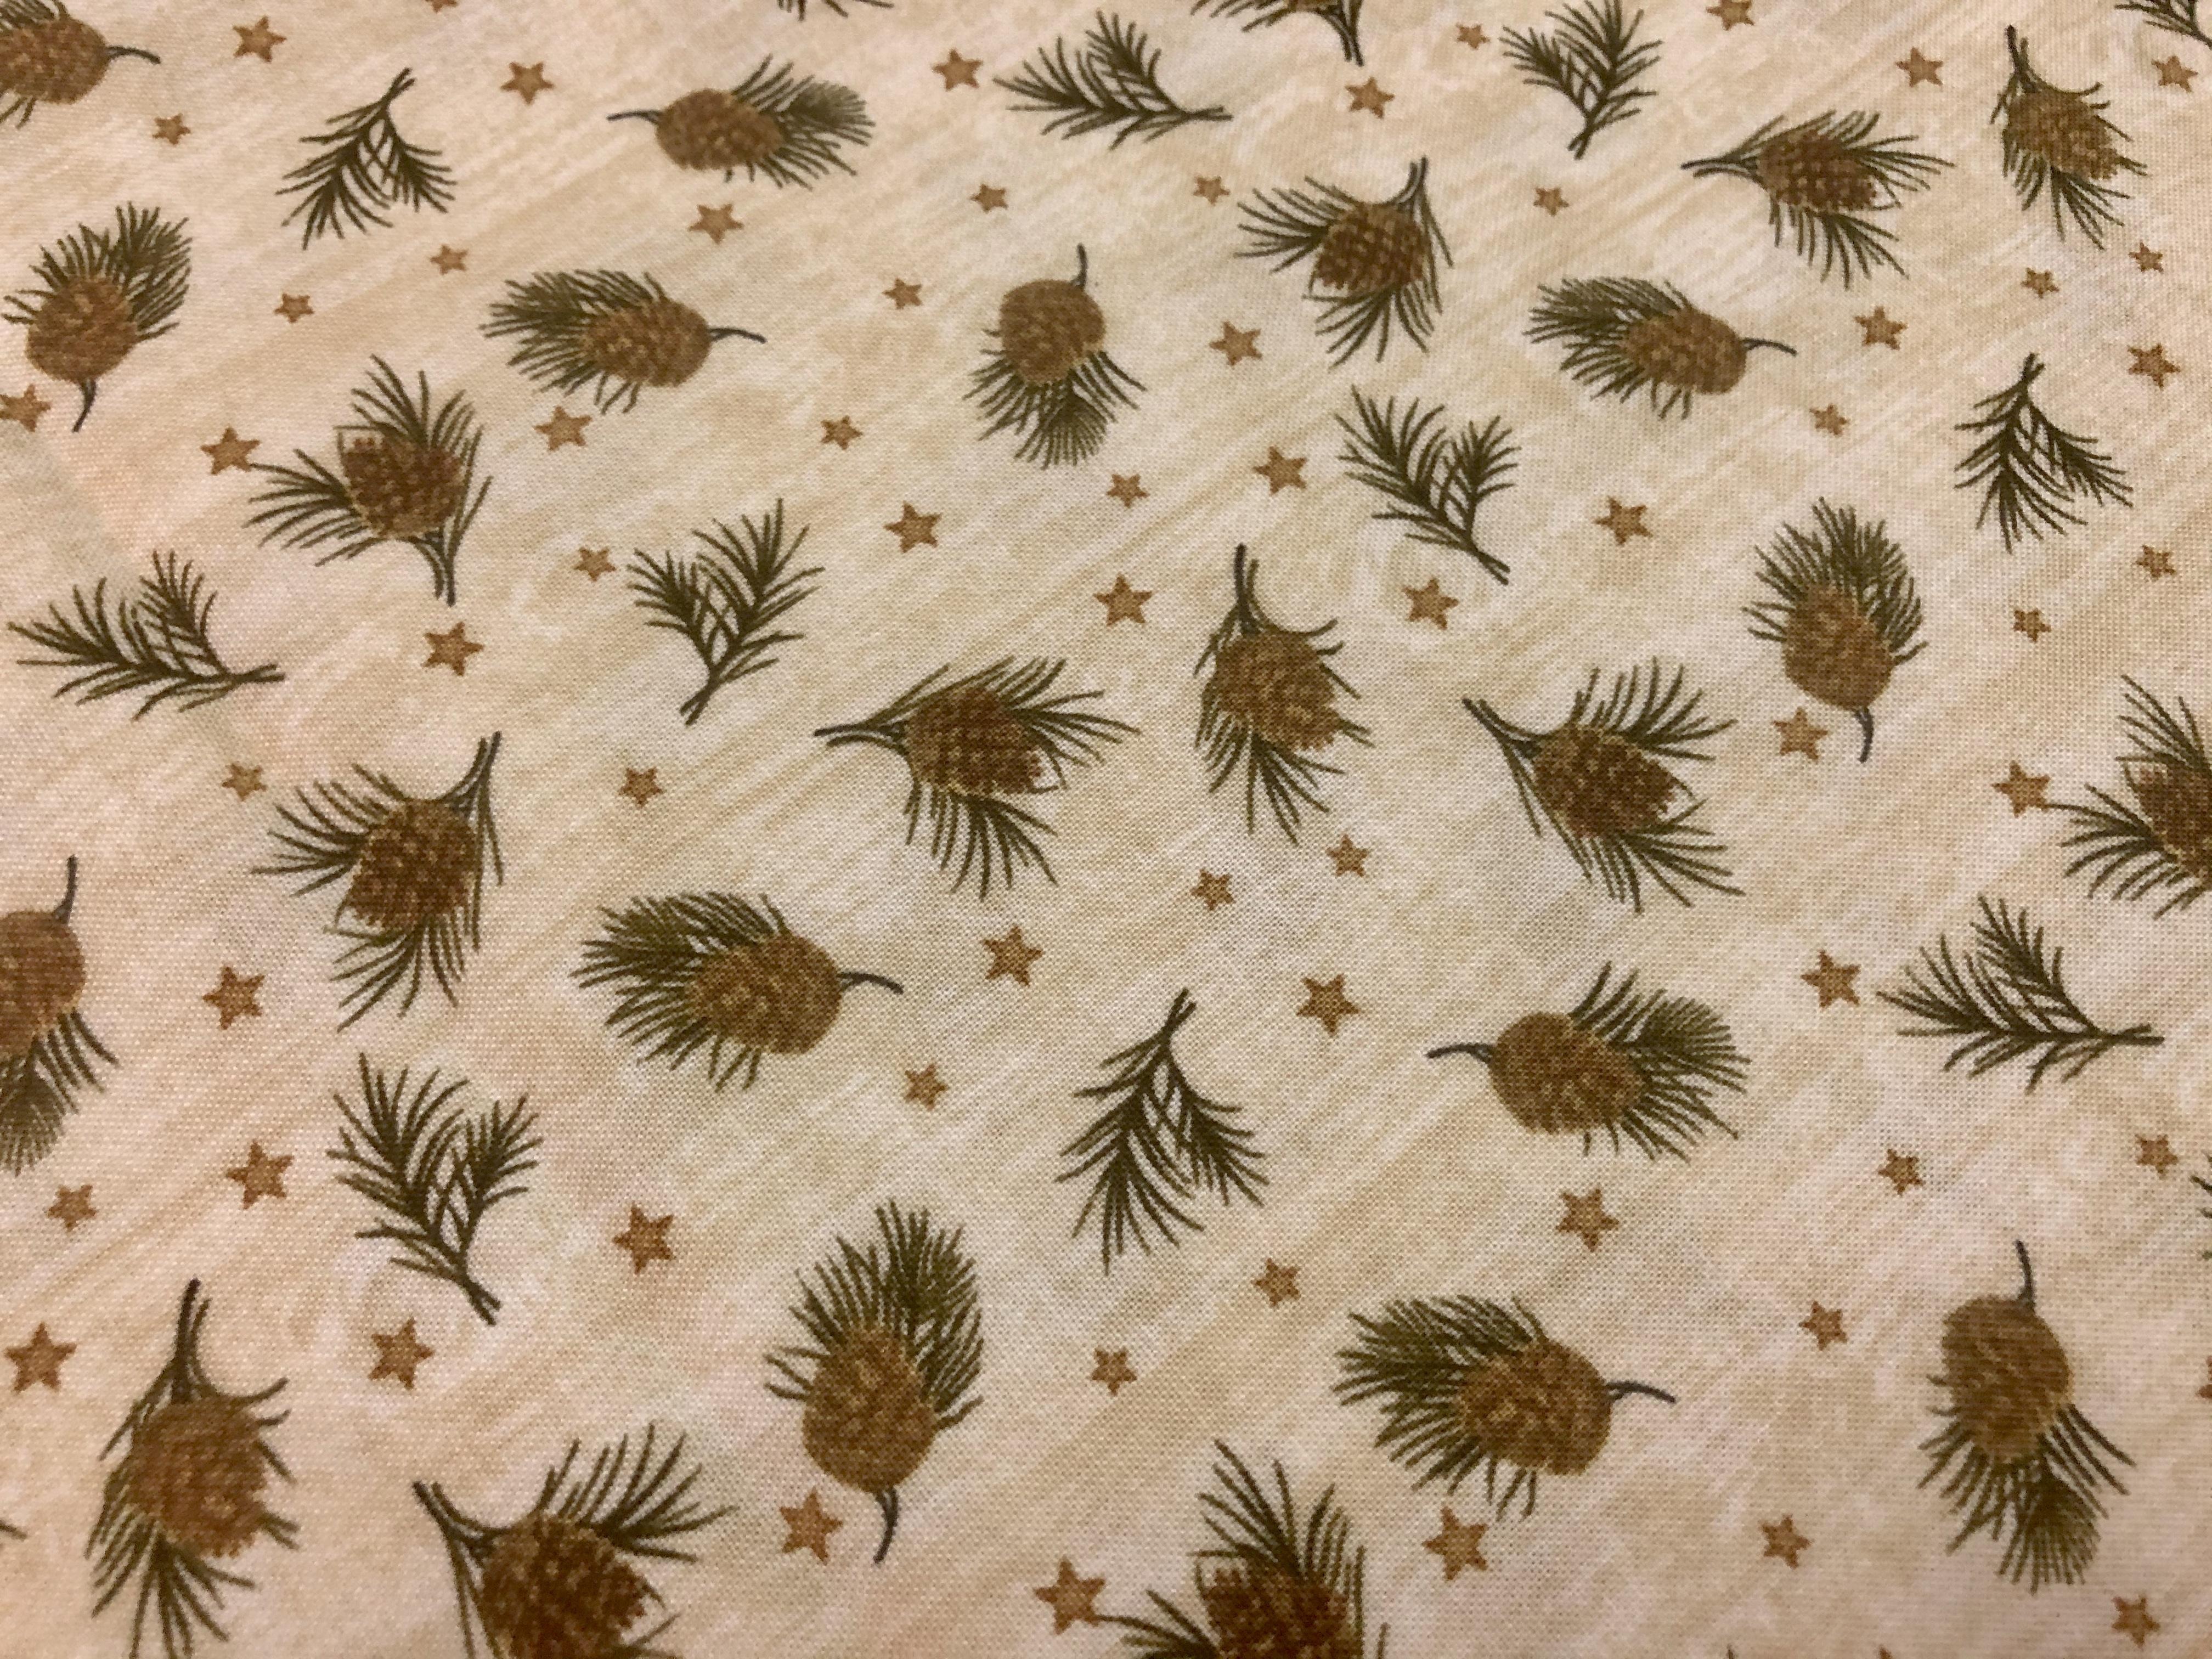 Pine and Stars  - Bernatex - 1/2m cut 56392